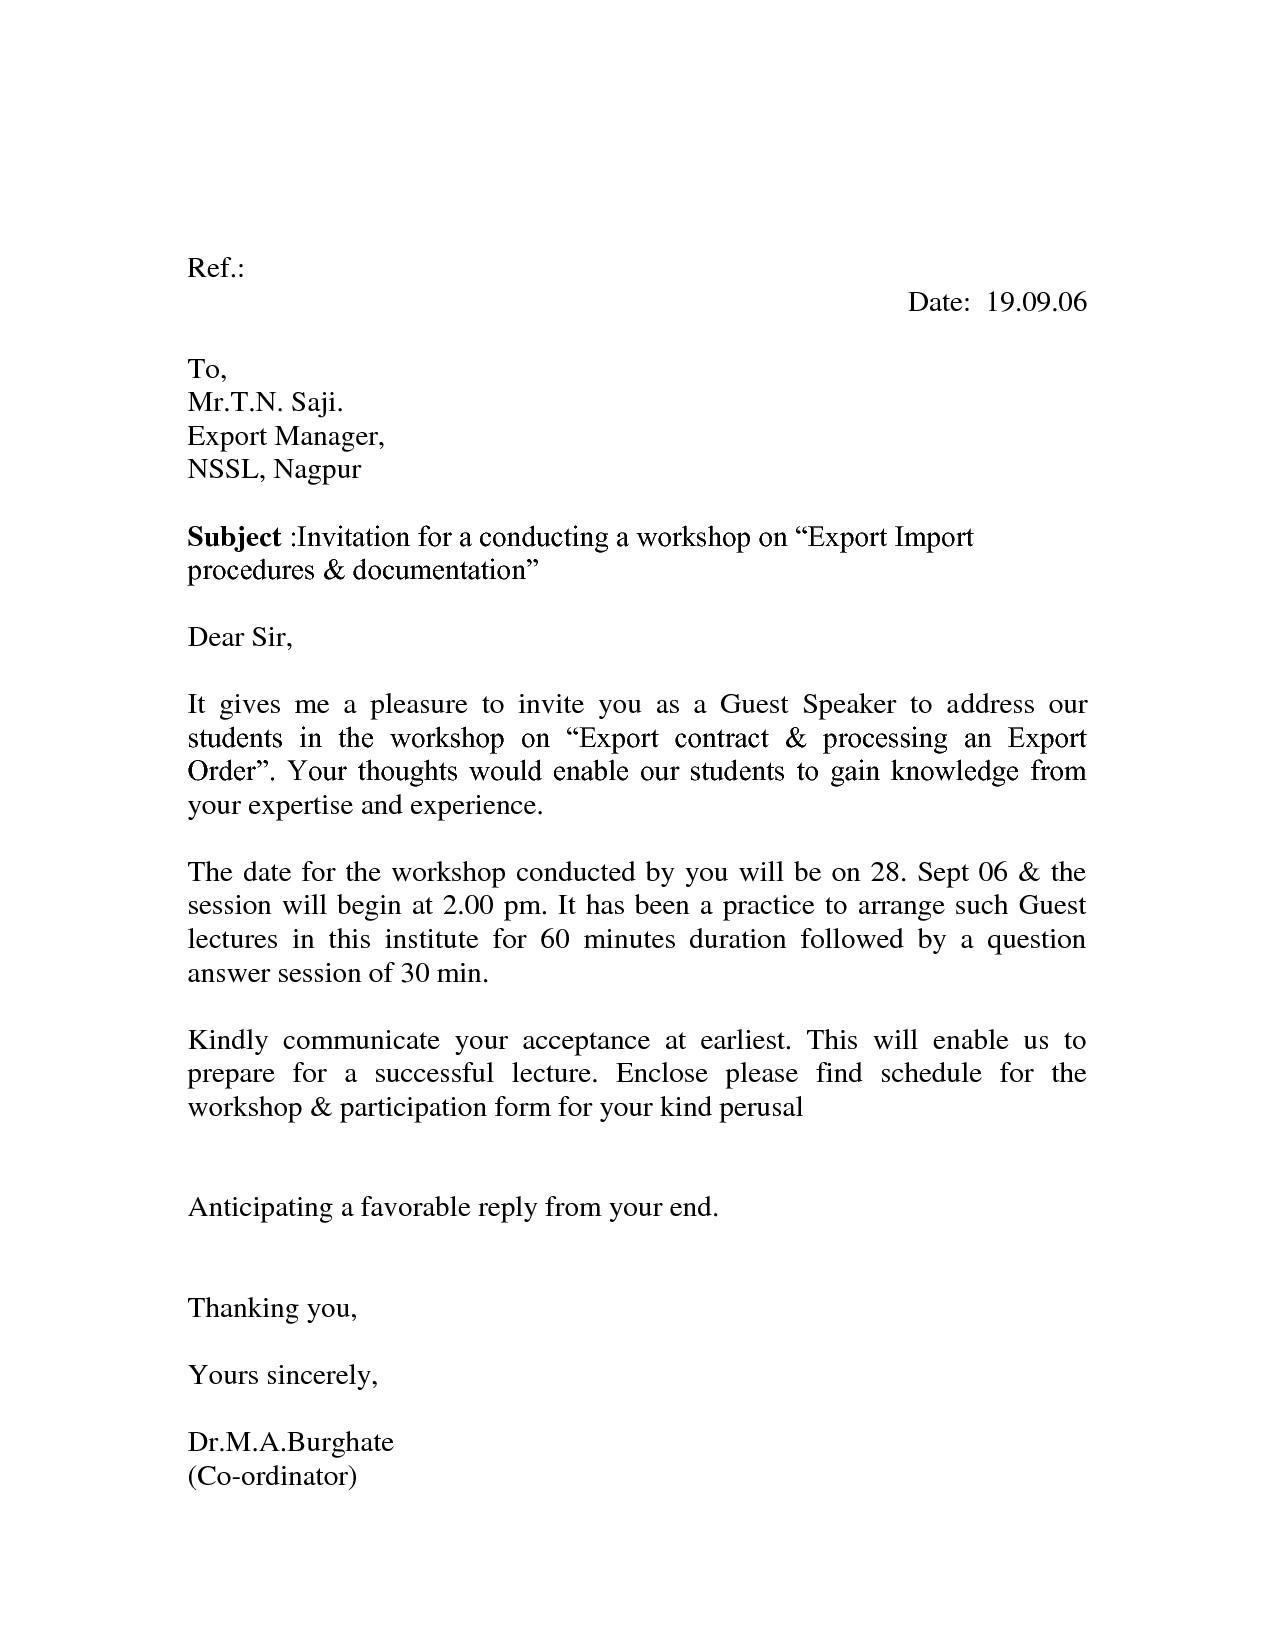 Formal Invitation Template Letter